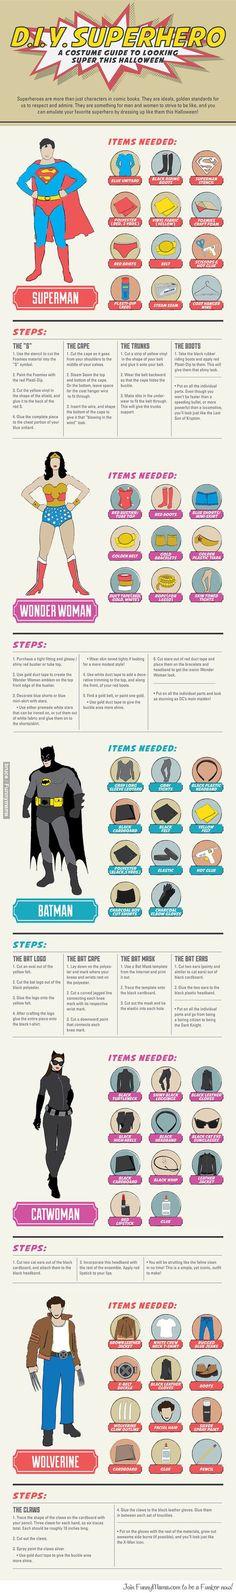 DIY Superhero! Happy Halloween!